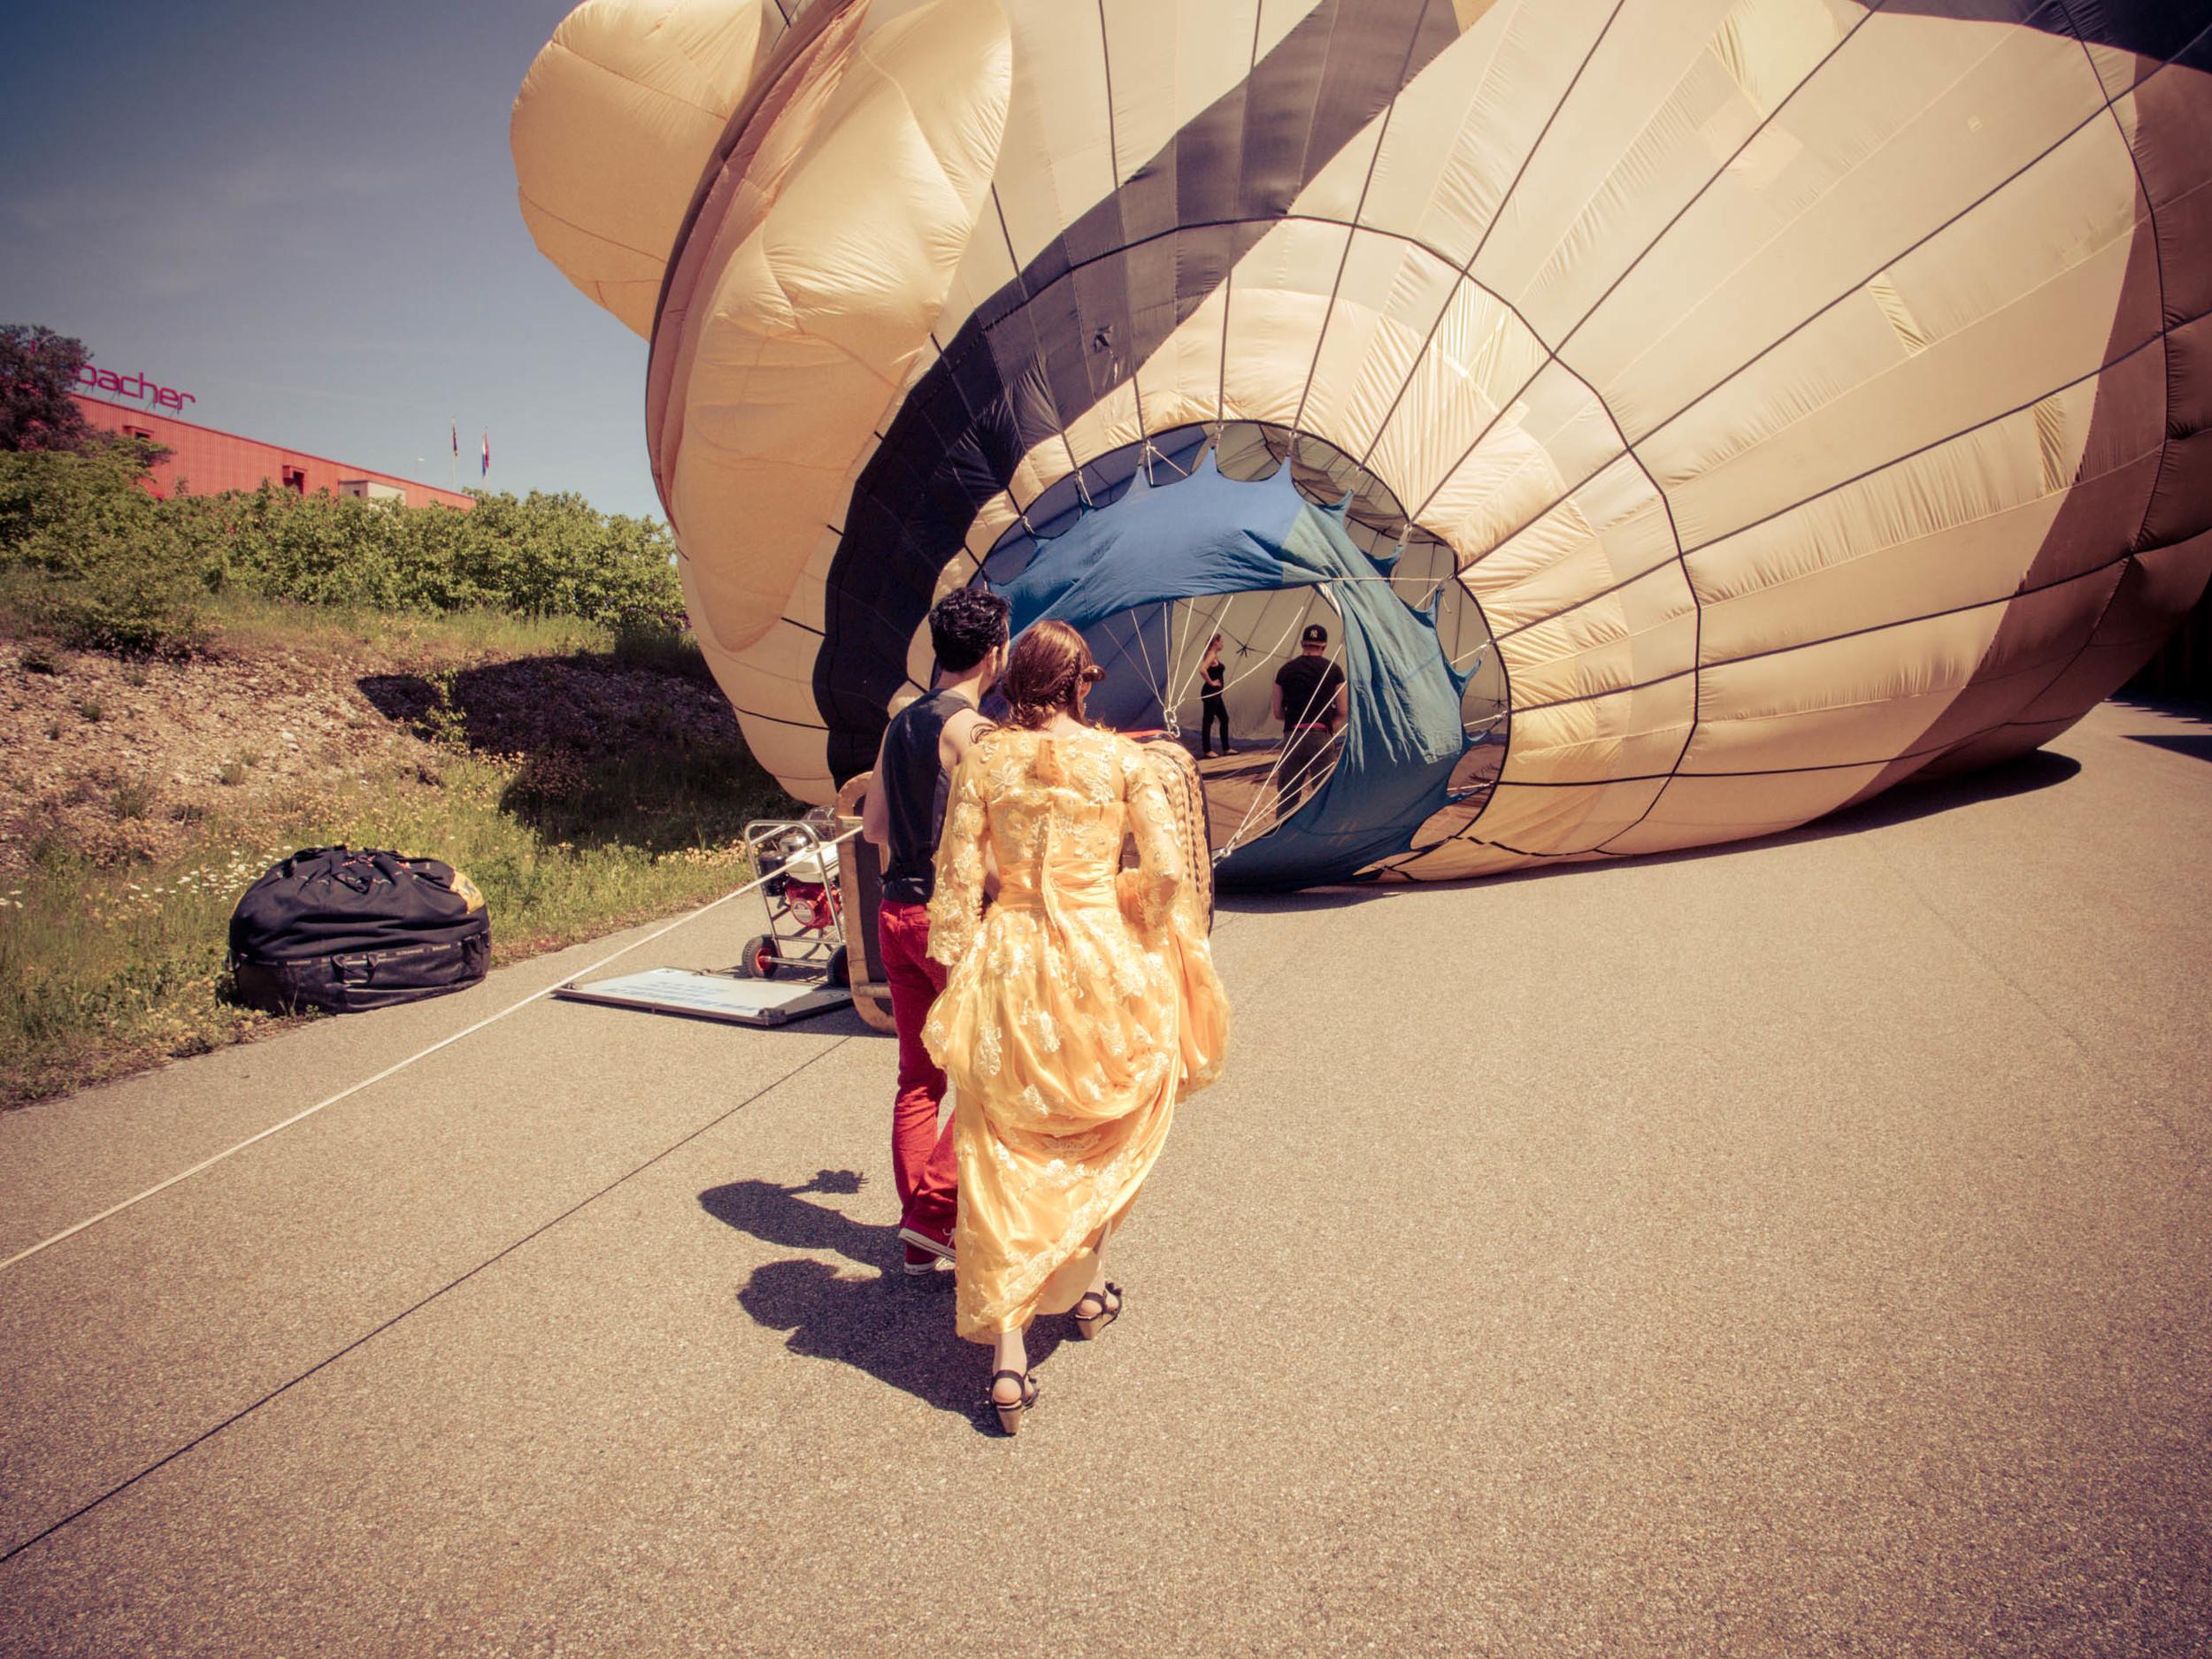 Heisslufballon_OMD-154.jpg